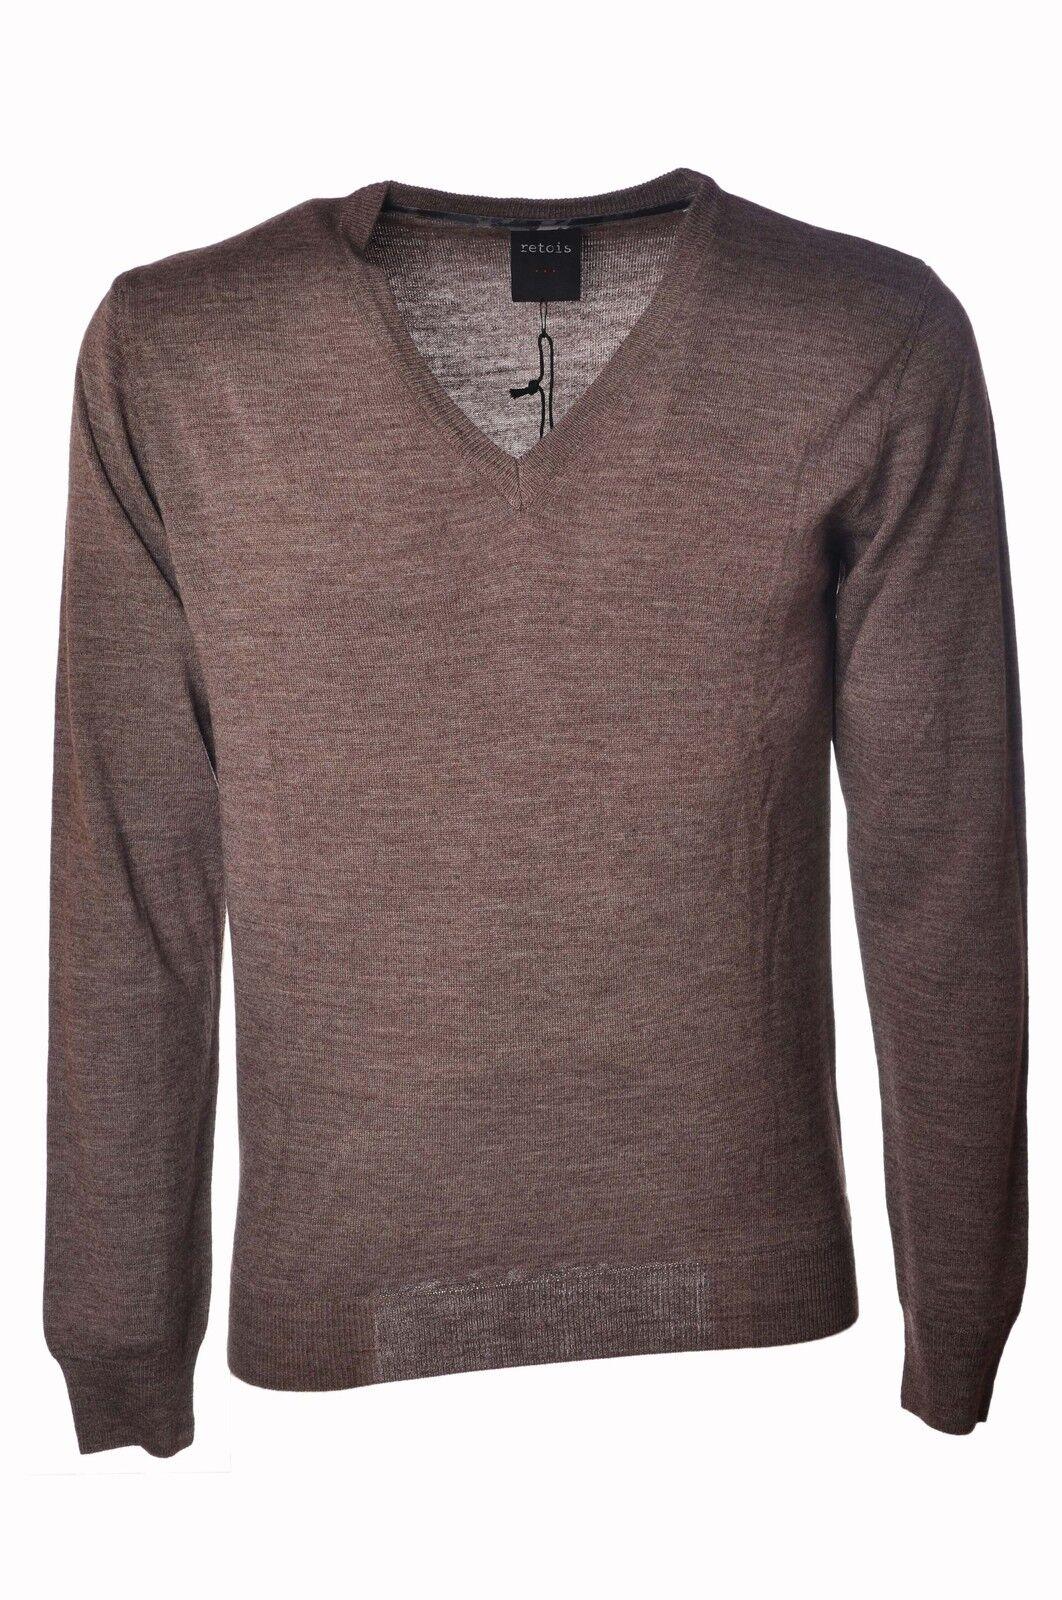 Retois  -  Sweaters - Male - Braun - 3858430N173713